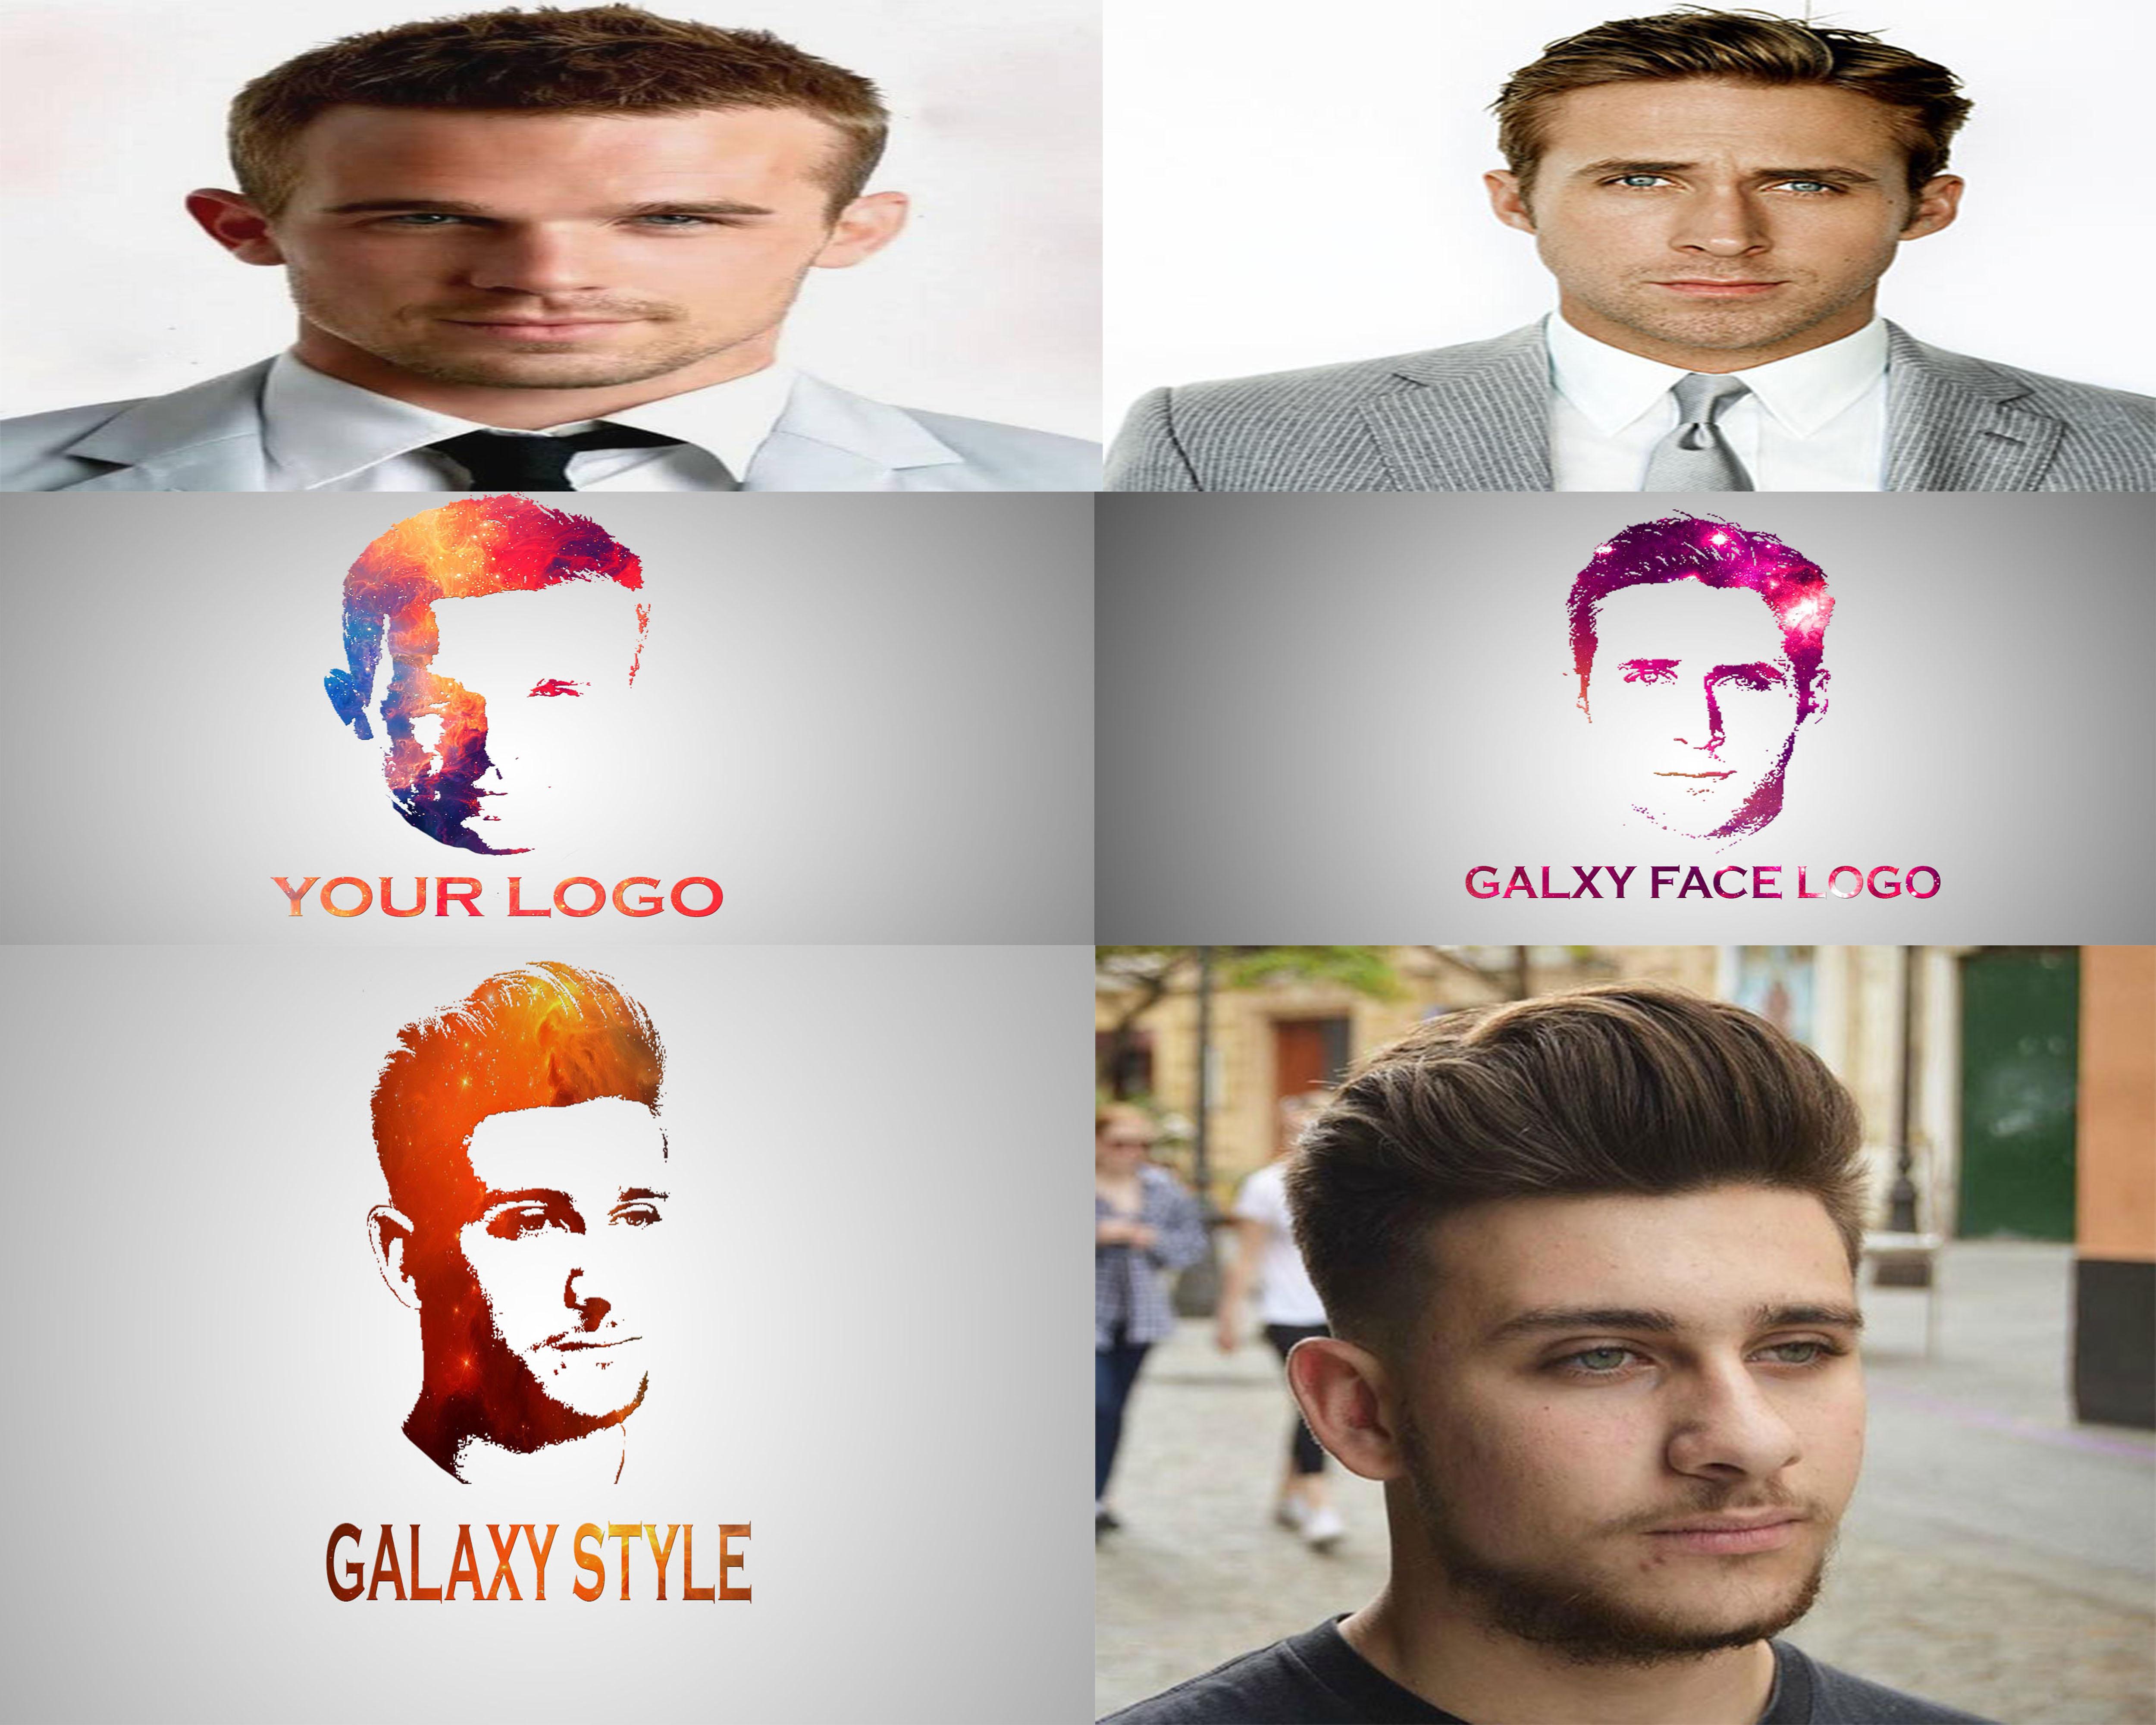 I'LL make an eye catching galaxy face LOGO